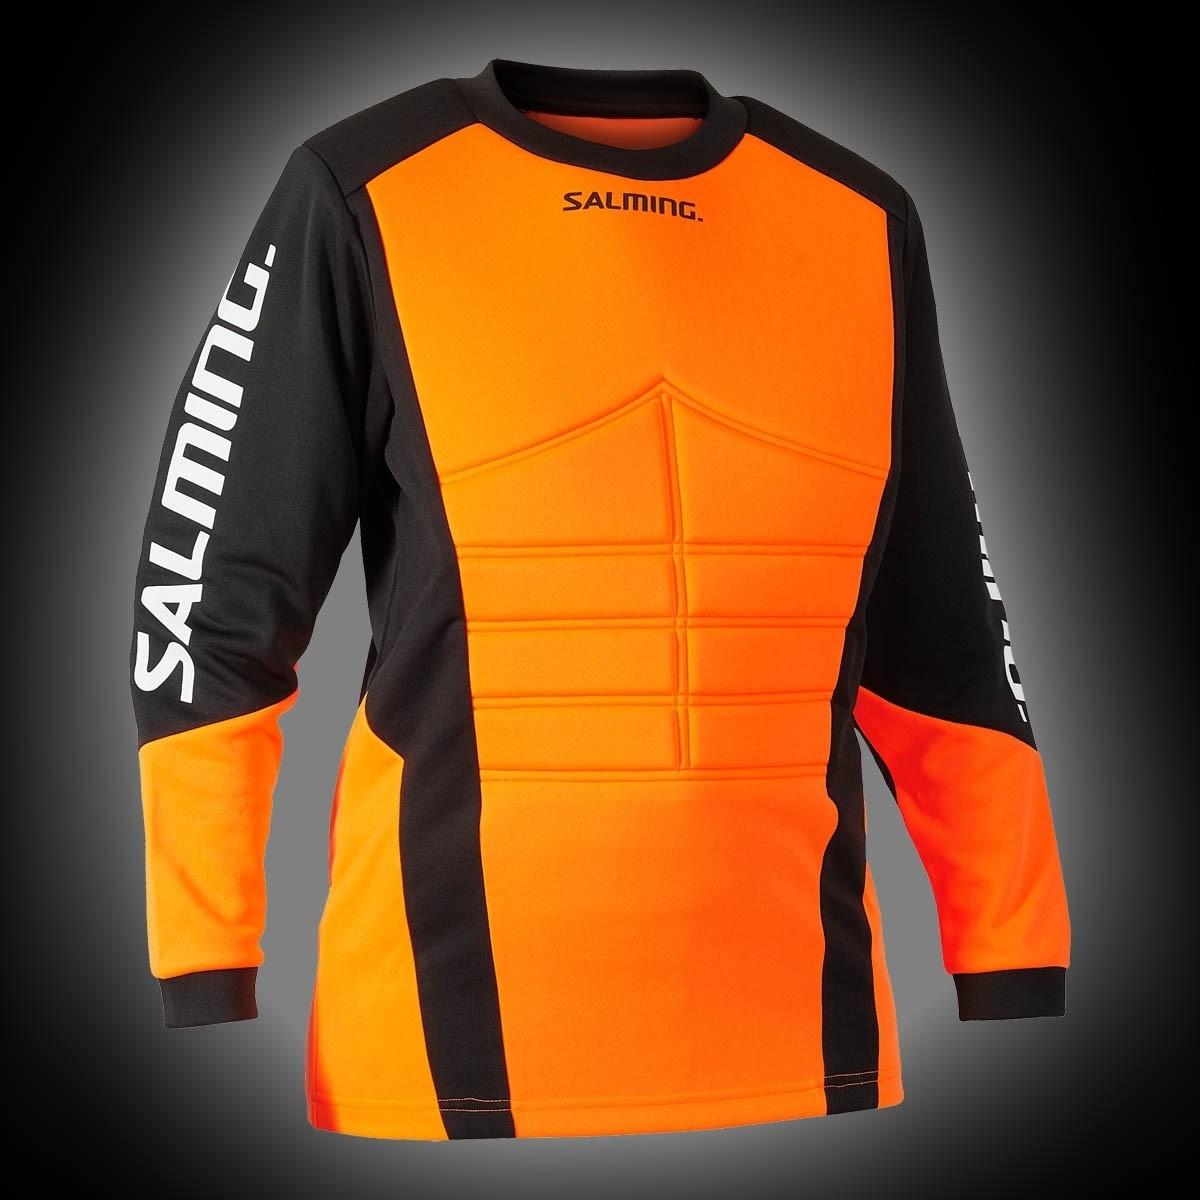 e34975ec6 Salming Goalie Jersey Attila Yellow Black